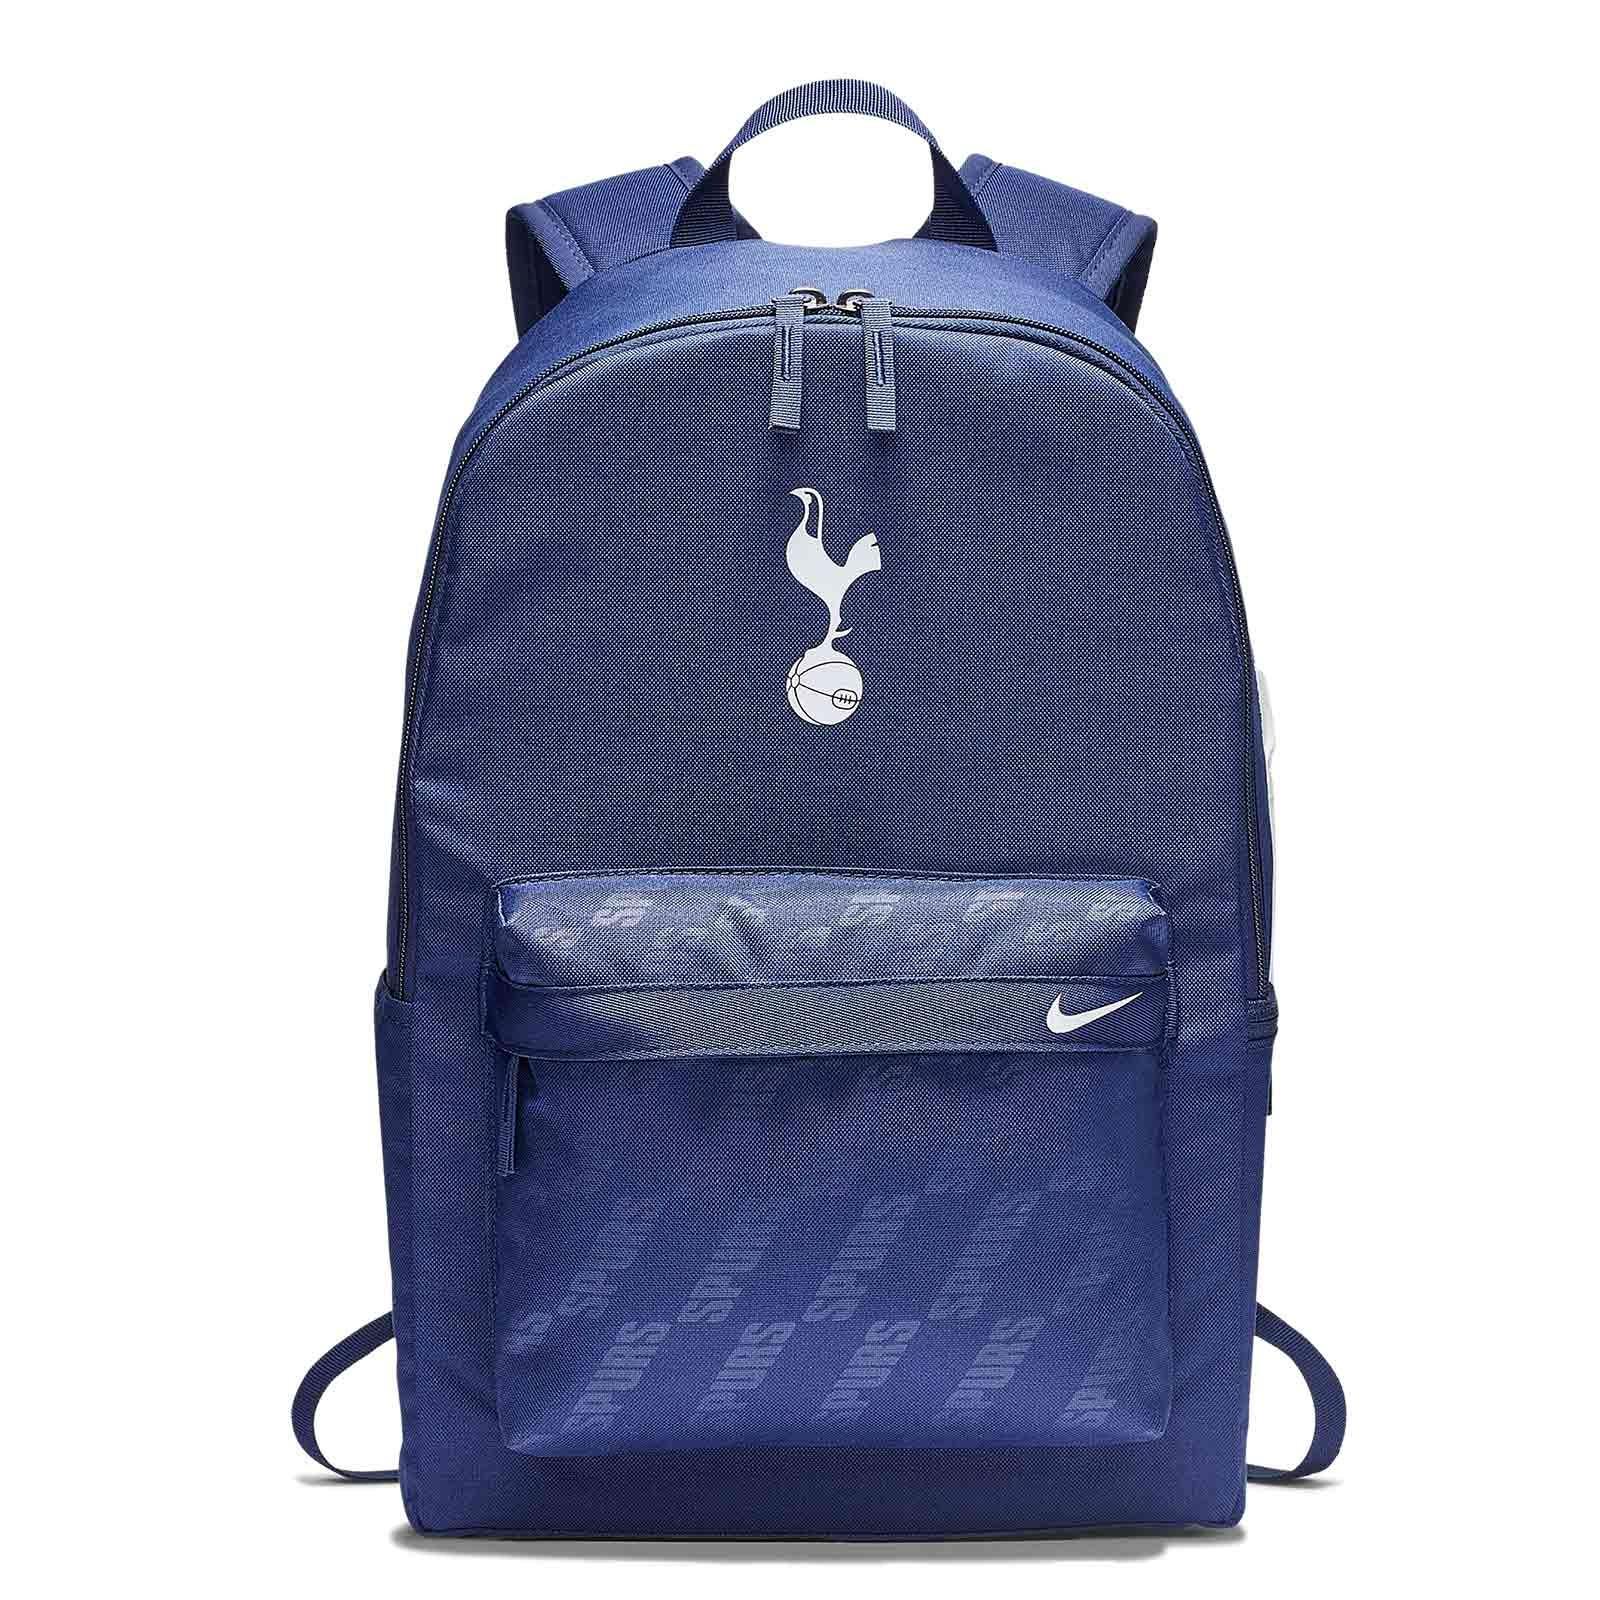 Mochila Nike Tottenham Nike Mochila Tottenham Mochila Stadium Nike Stadium Tottenham WEHI2D9